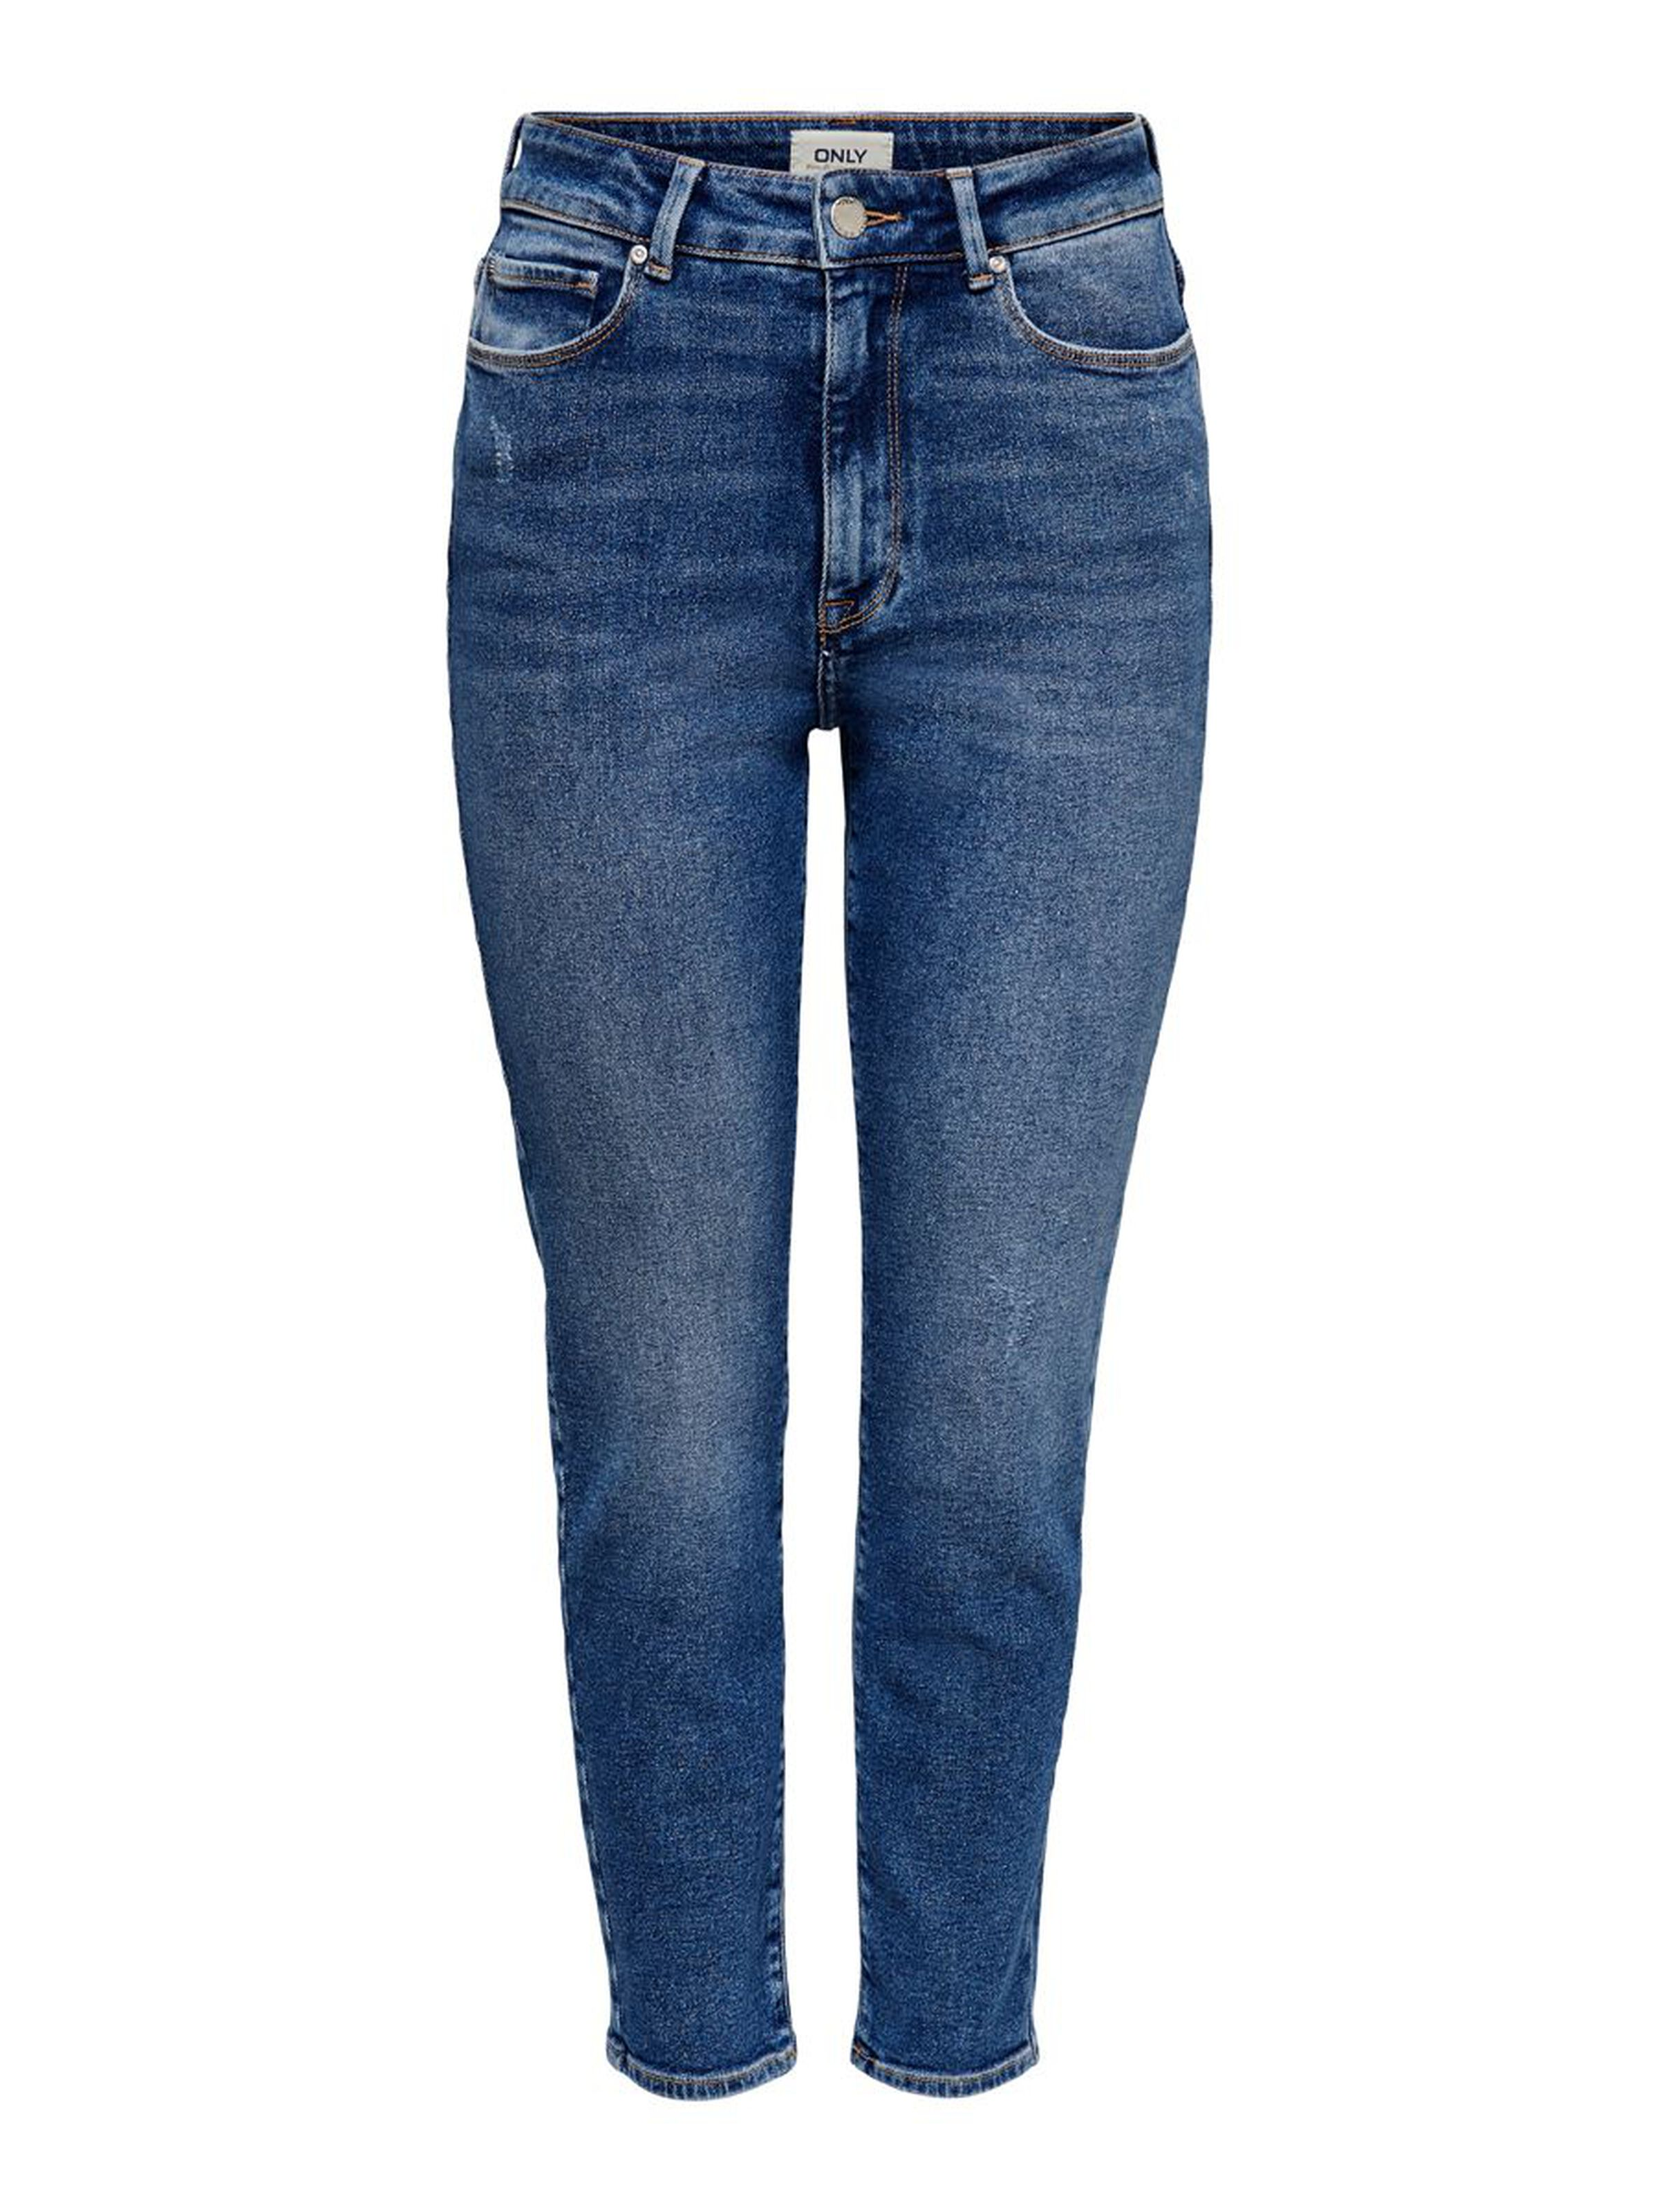 Jeans da donna EMILY ONLY | EMILY-15235791718L32